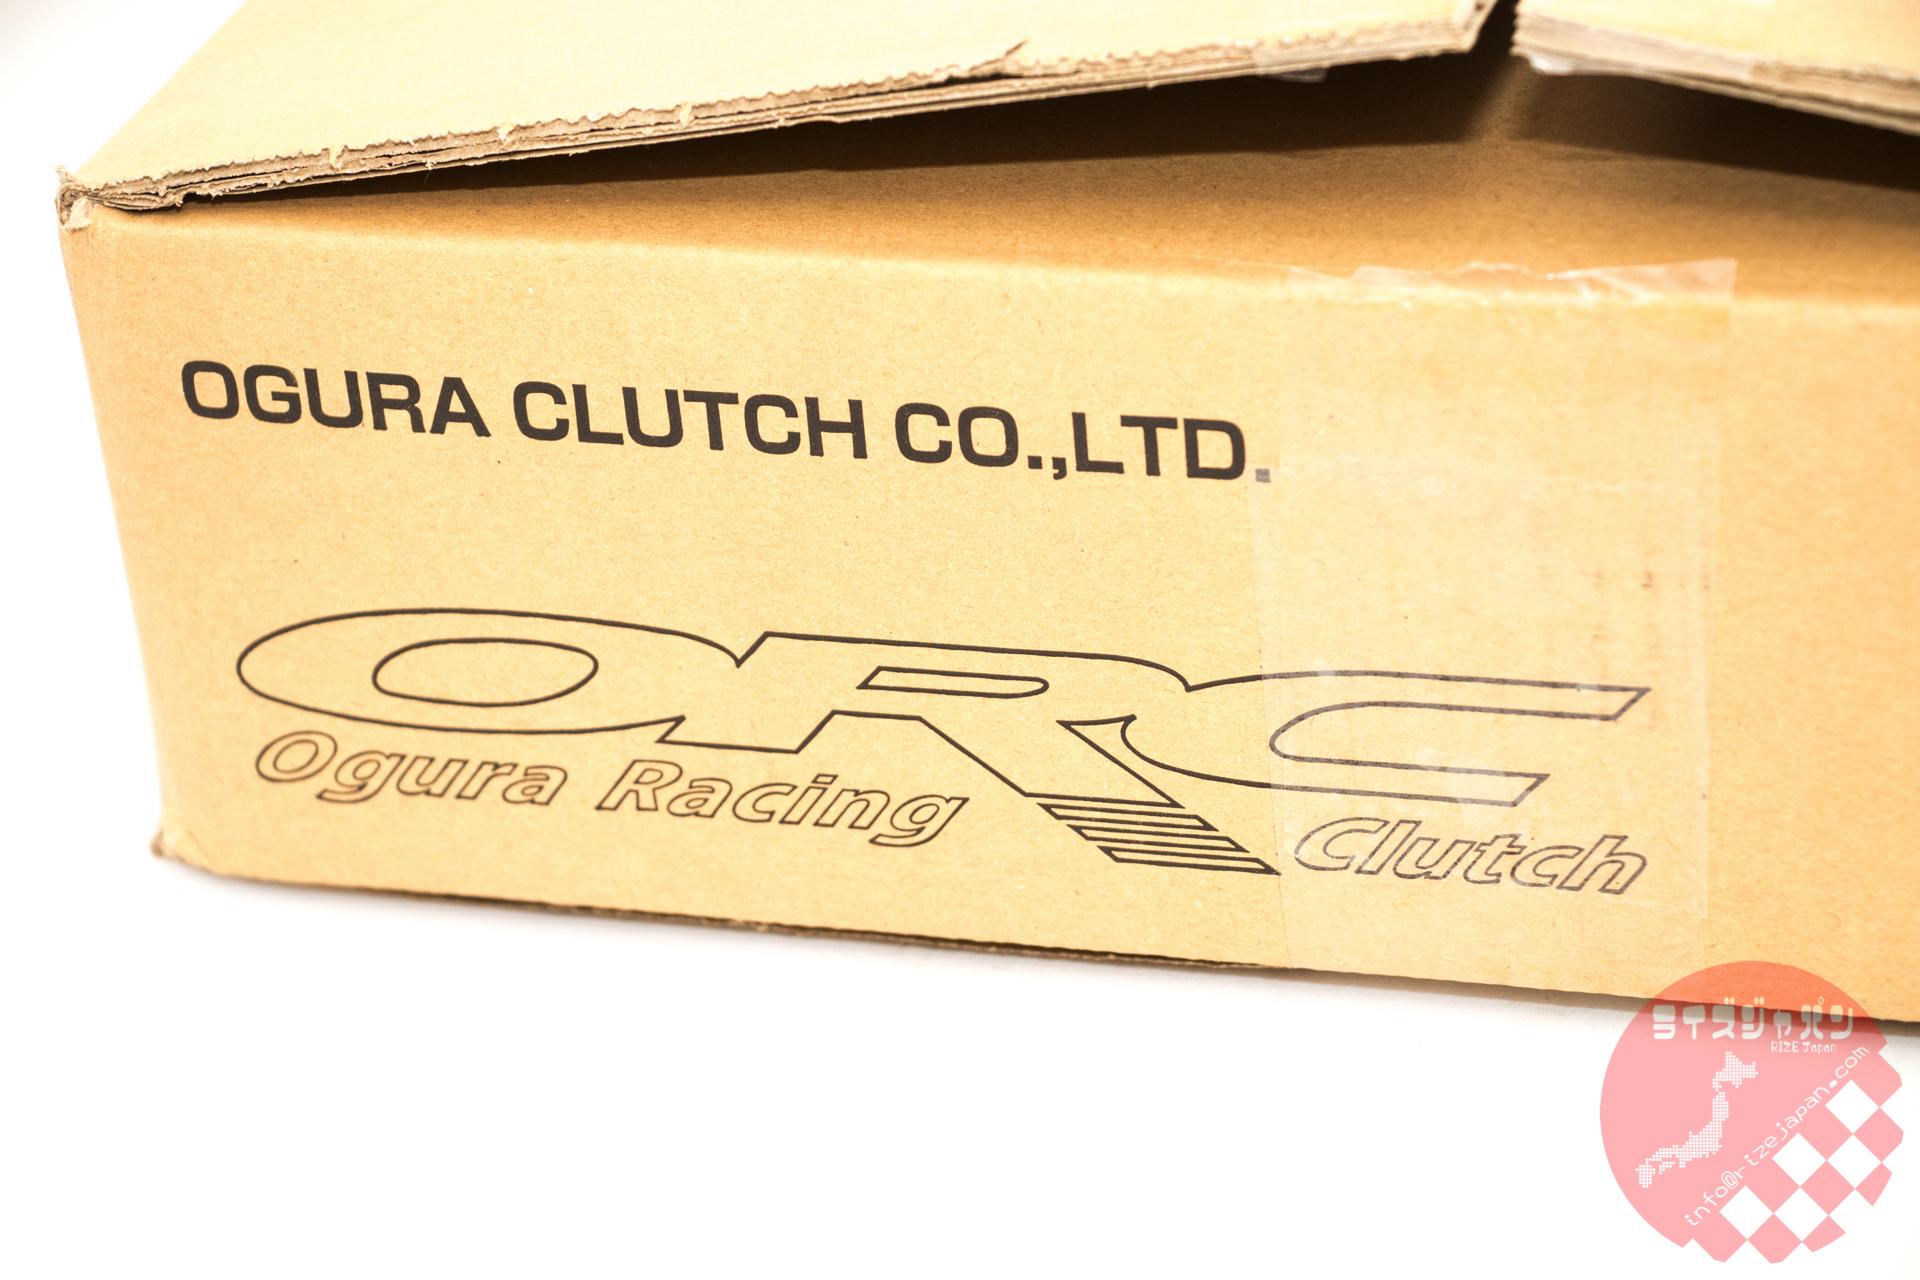 ORC オグラクラッチ オーバーホールキット 409 メタルシングル プッシュ式 ダンパー付き用 / ORC Oguraclitch over haul kit 409 single Push type Dumper model